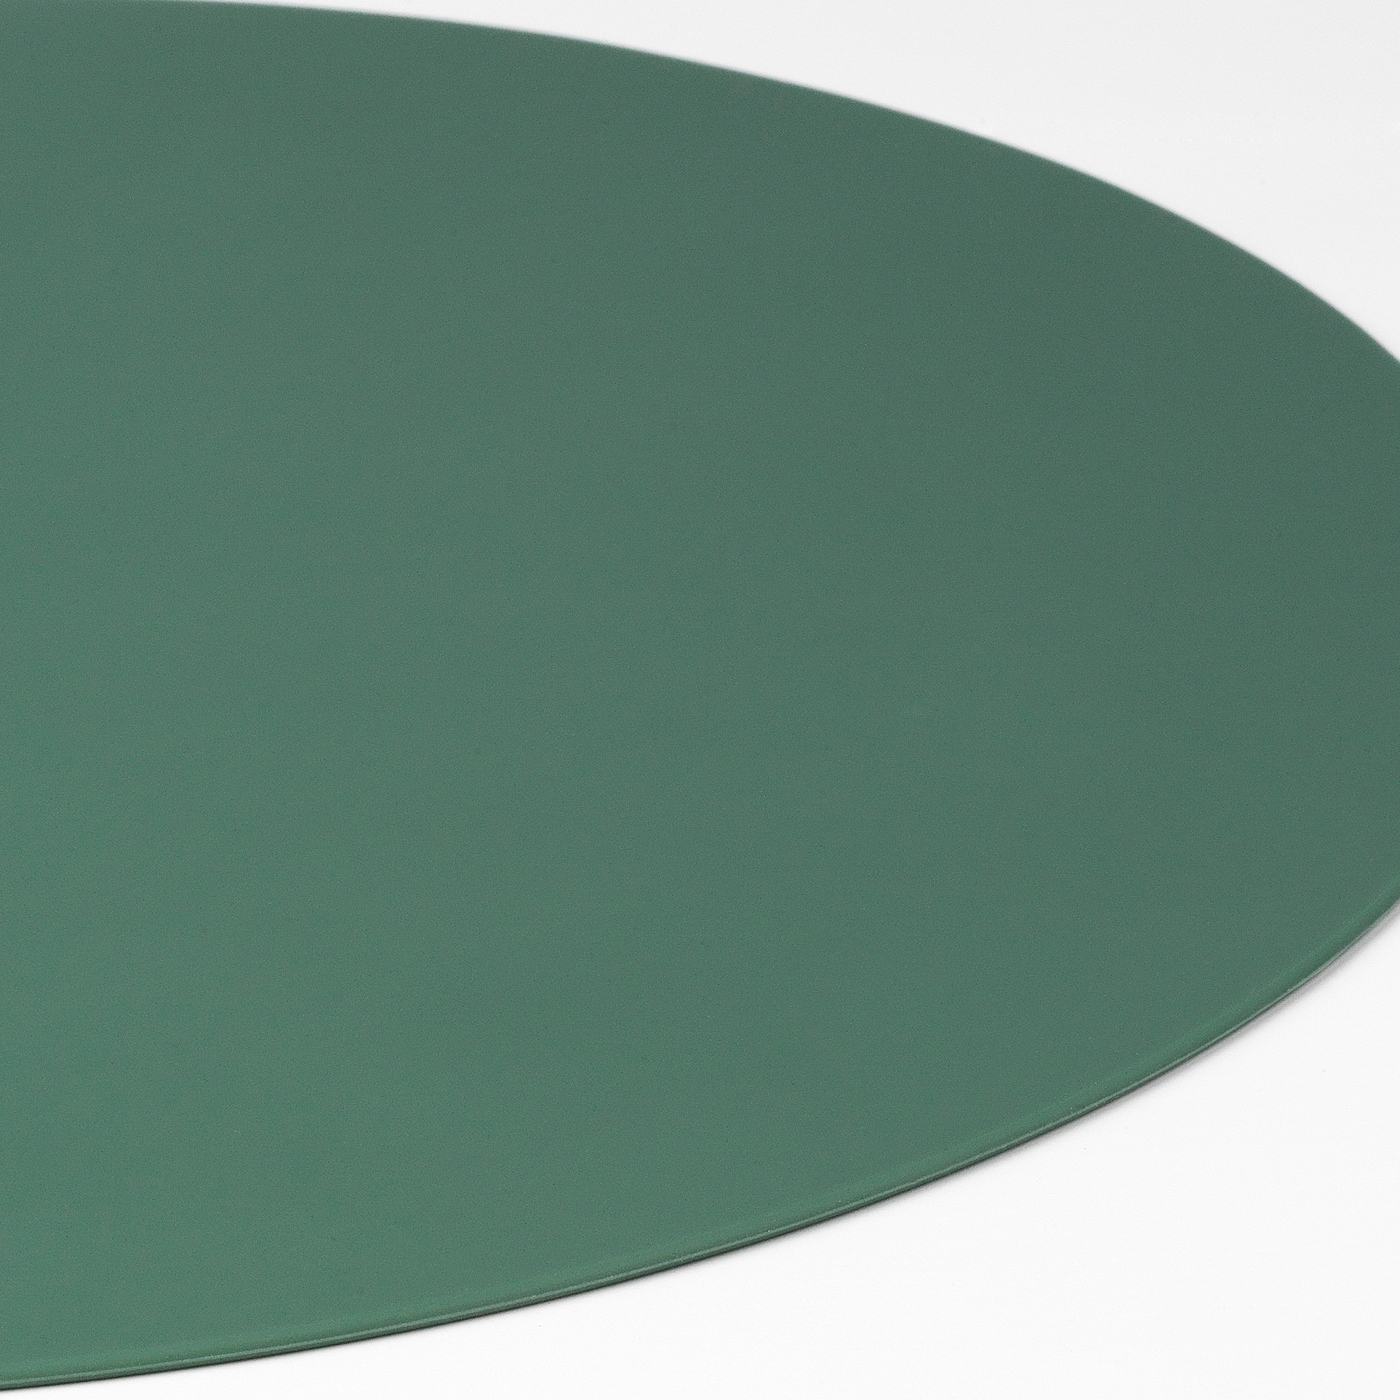 OMTÄNKSAM Place mat with anti-slip, green, 45x35 cm